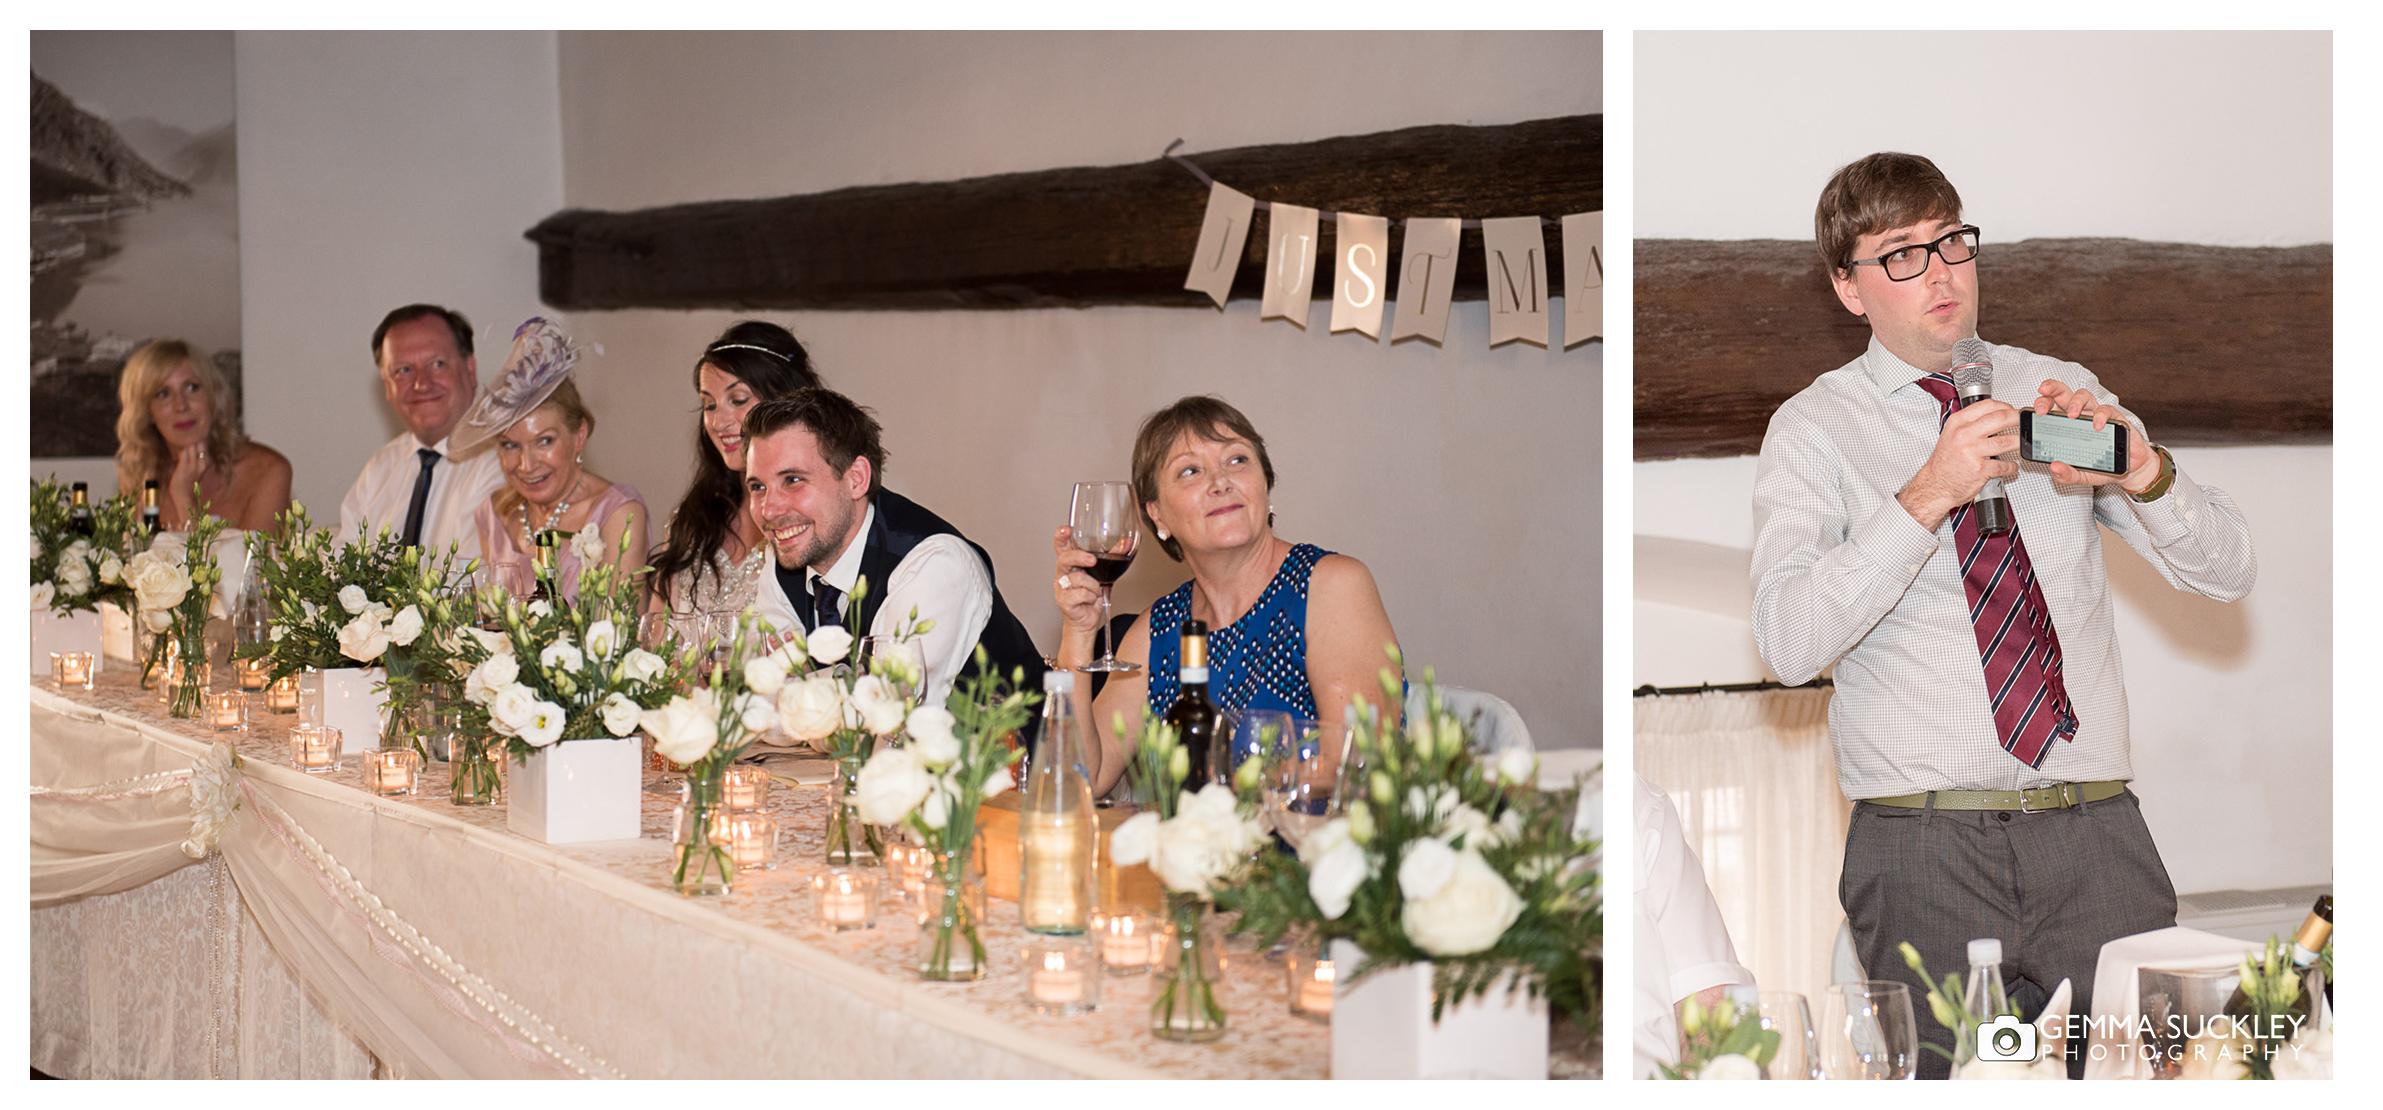 Bestman making his wedding speech